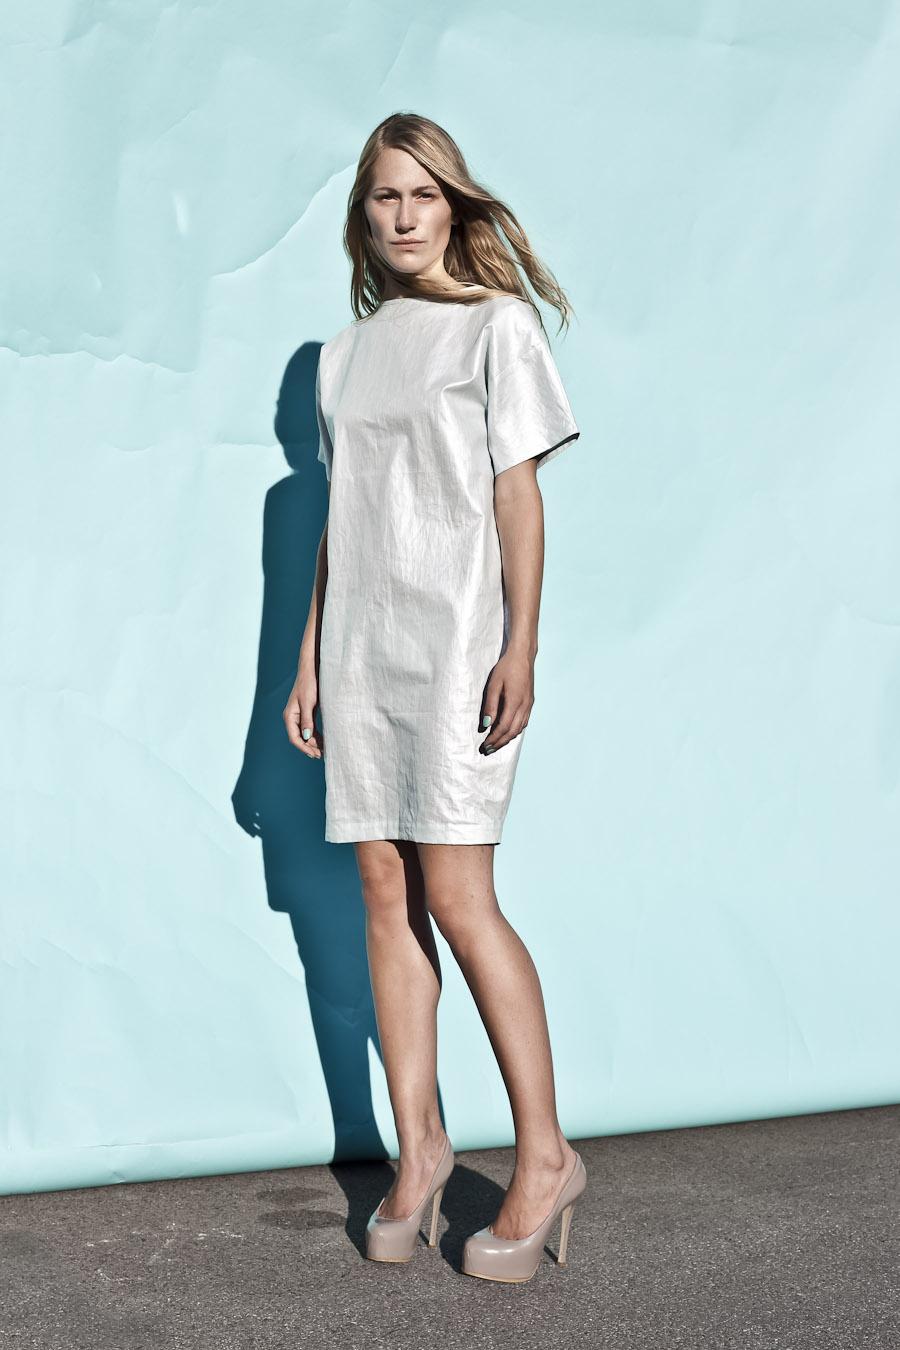 dress: Saphir